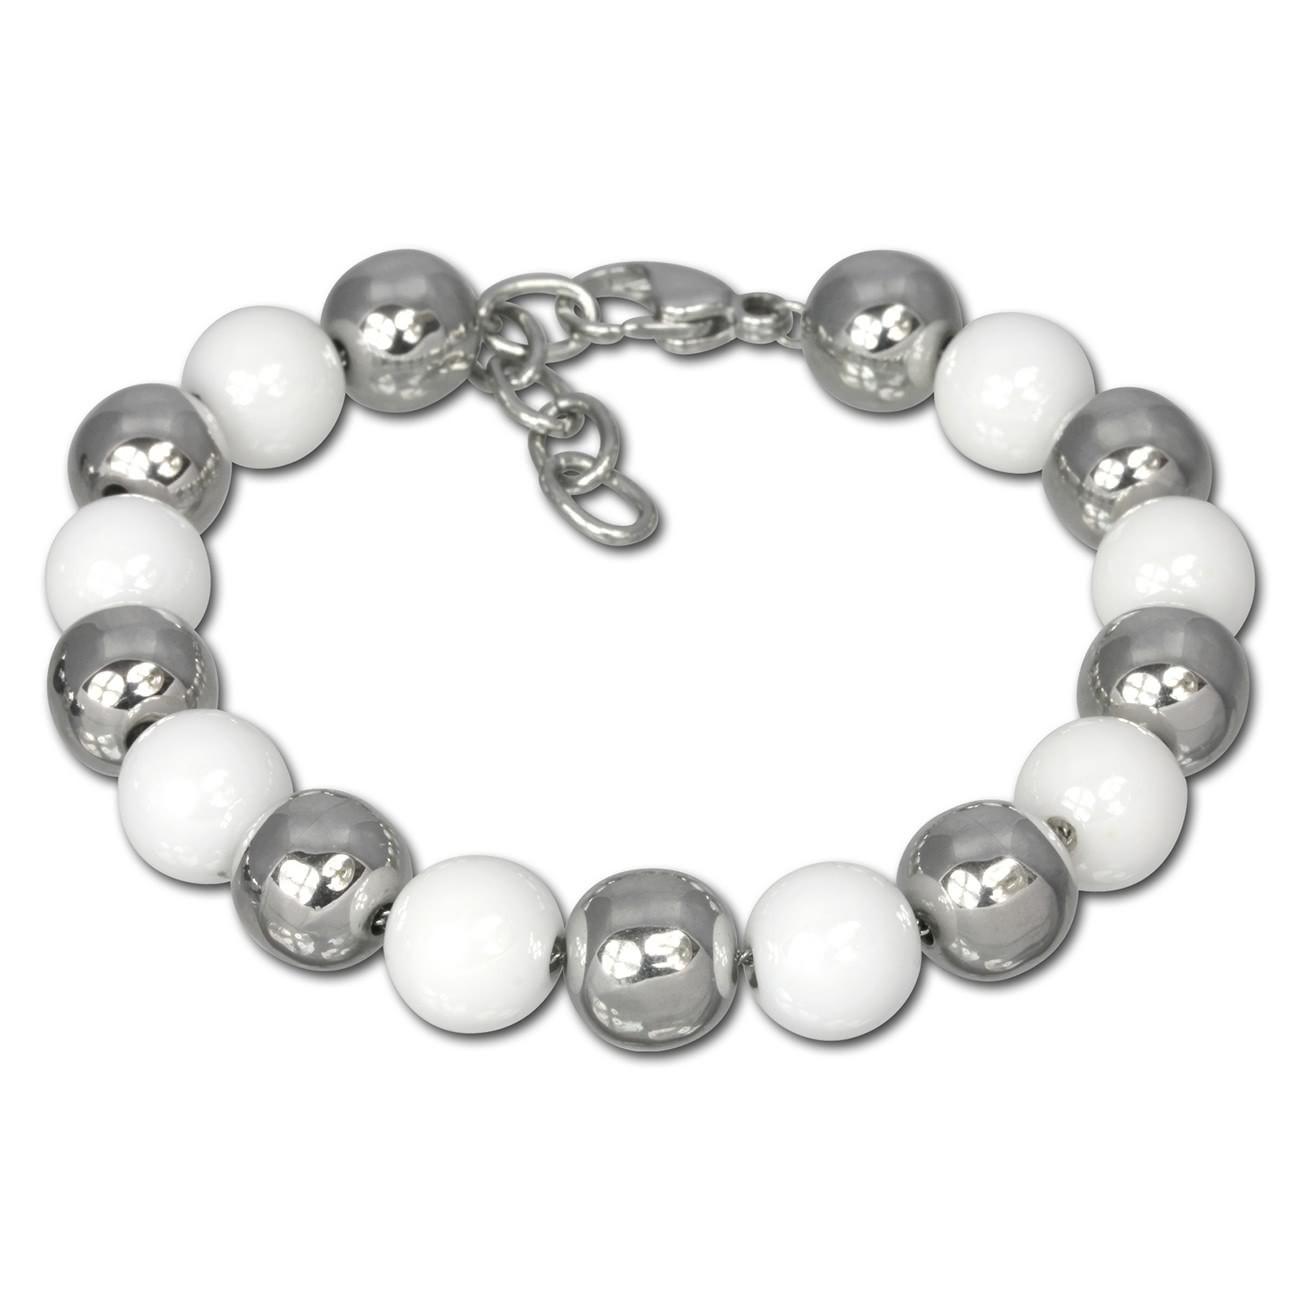 Amello Armband Keramik Kugeln weiß Damen Edelstahlschmuck ESAX12W